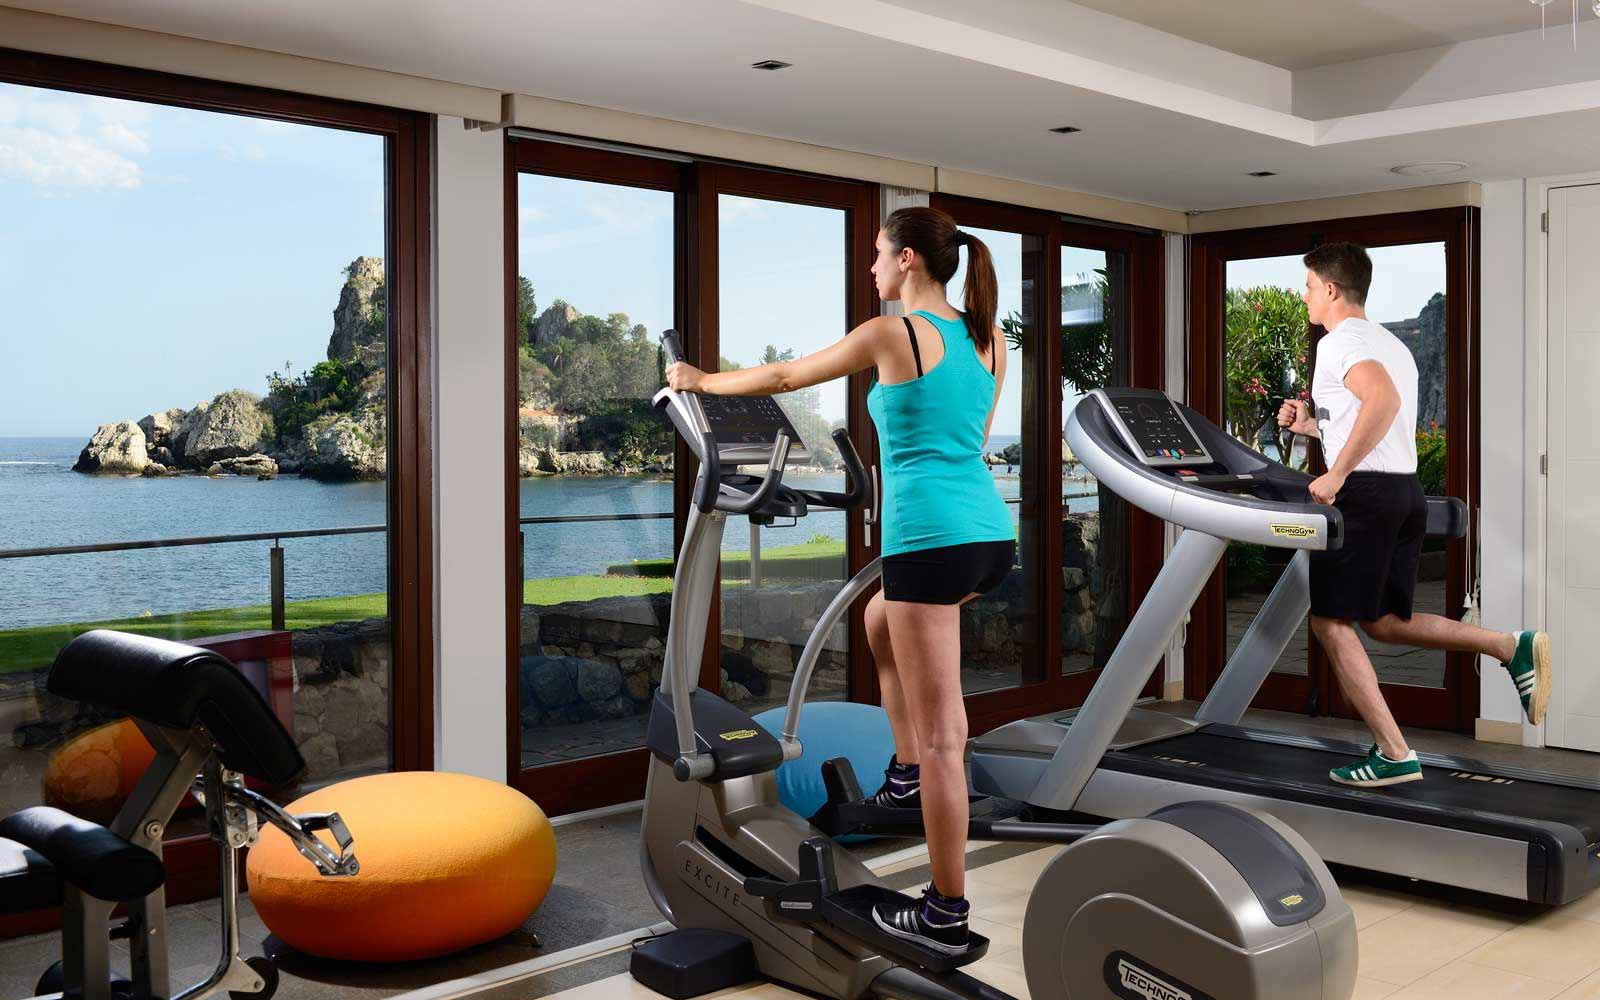 Fitness room at La Plage Resort